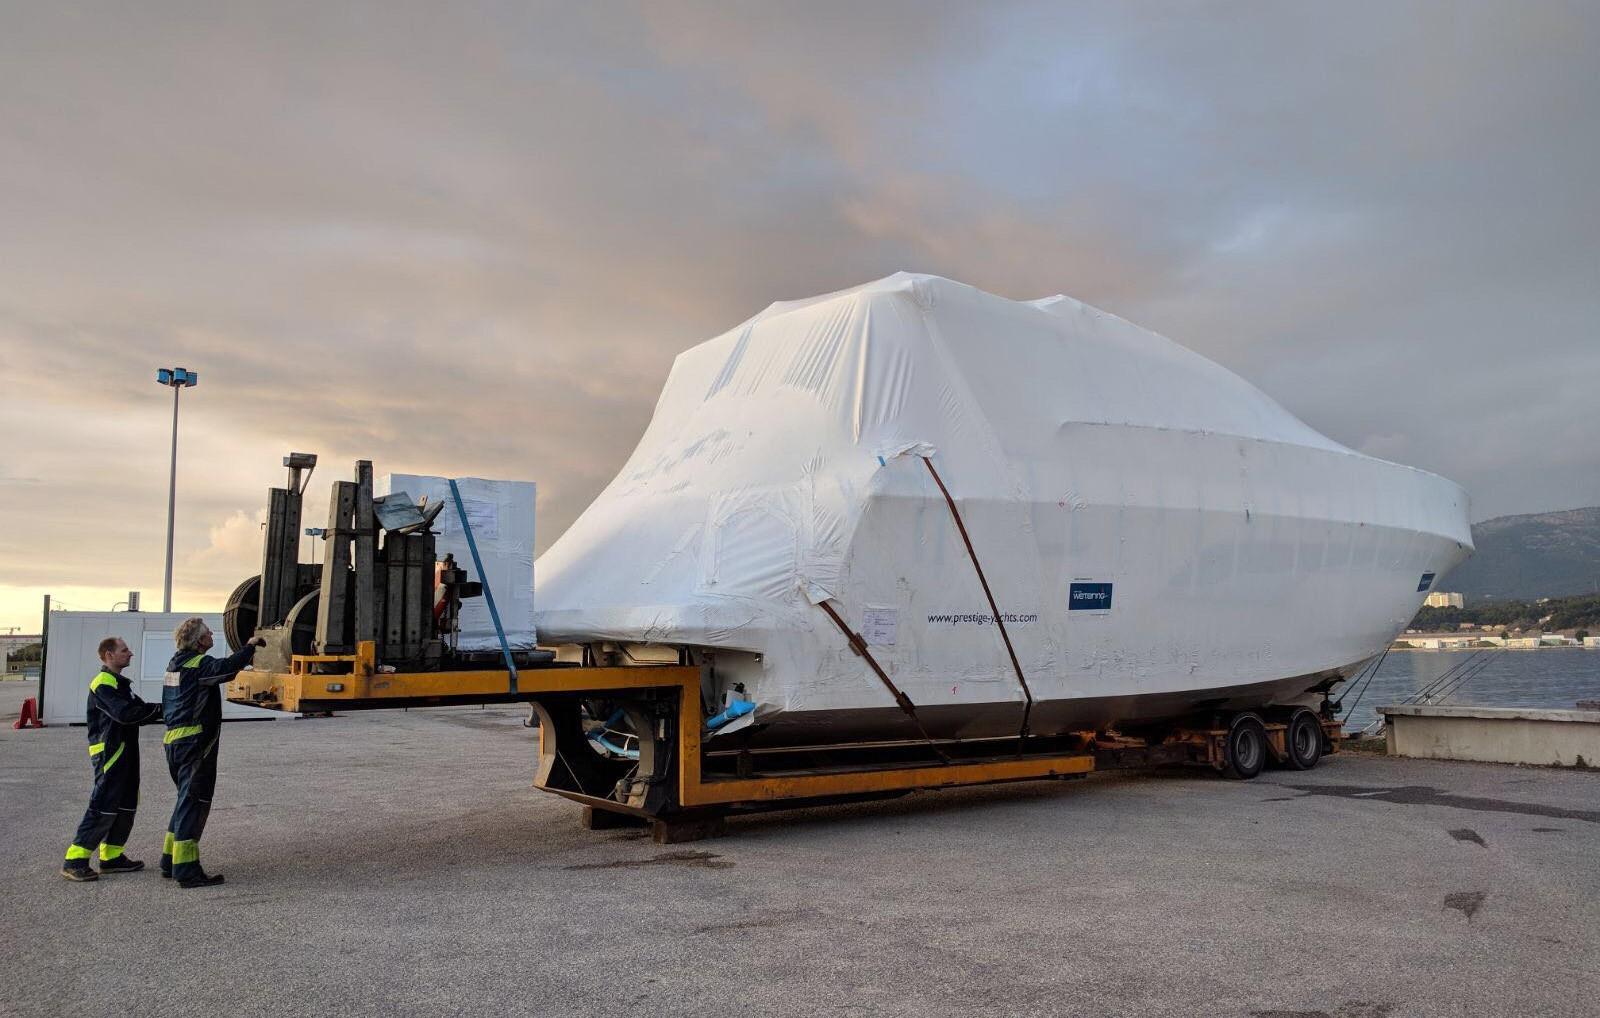 Mega Yacht Transport - Tekne Taşıma